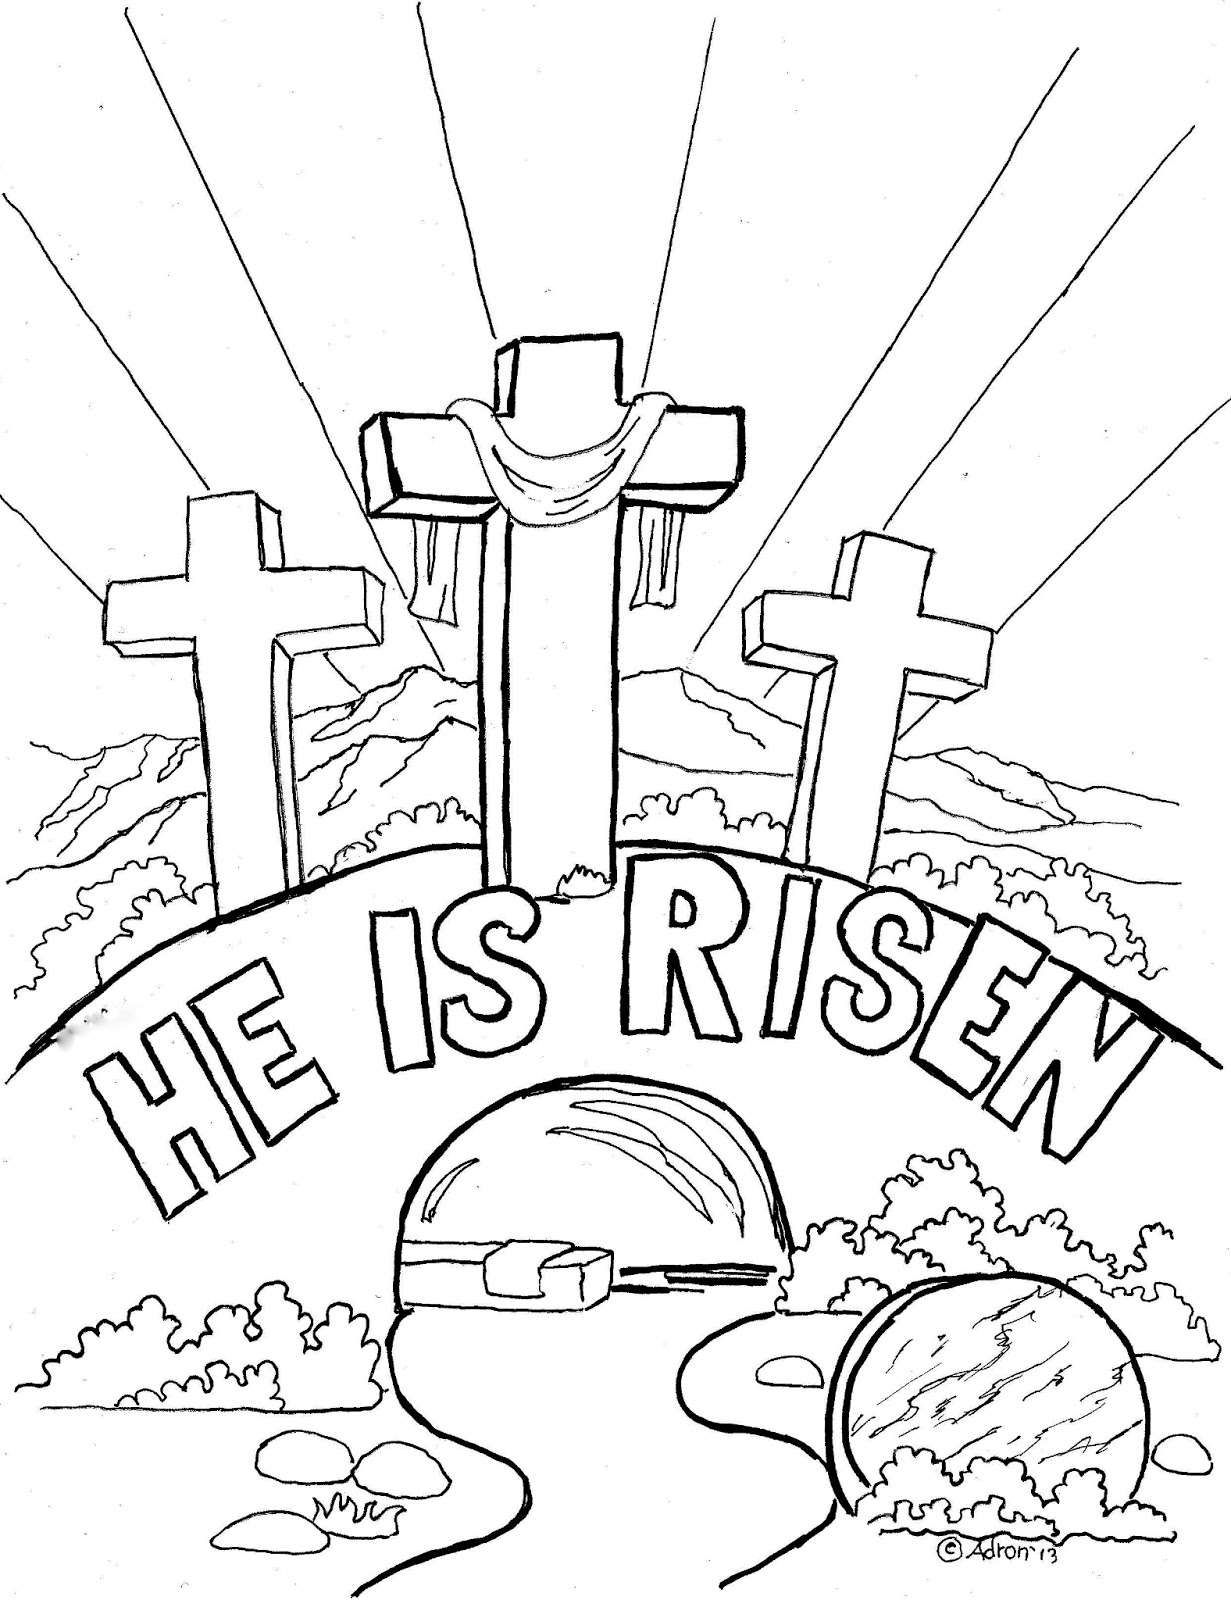 Happy Easter Printable Camaxid Com Sunday School Coloring Pages Easter Sunday School Easter Coloring Pages Printable